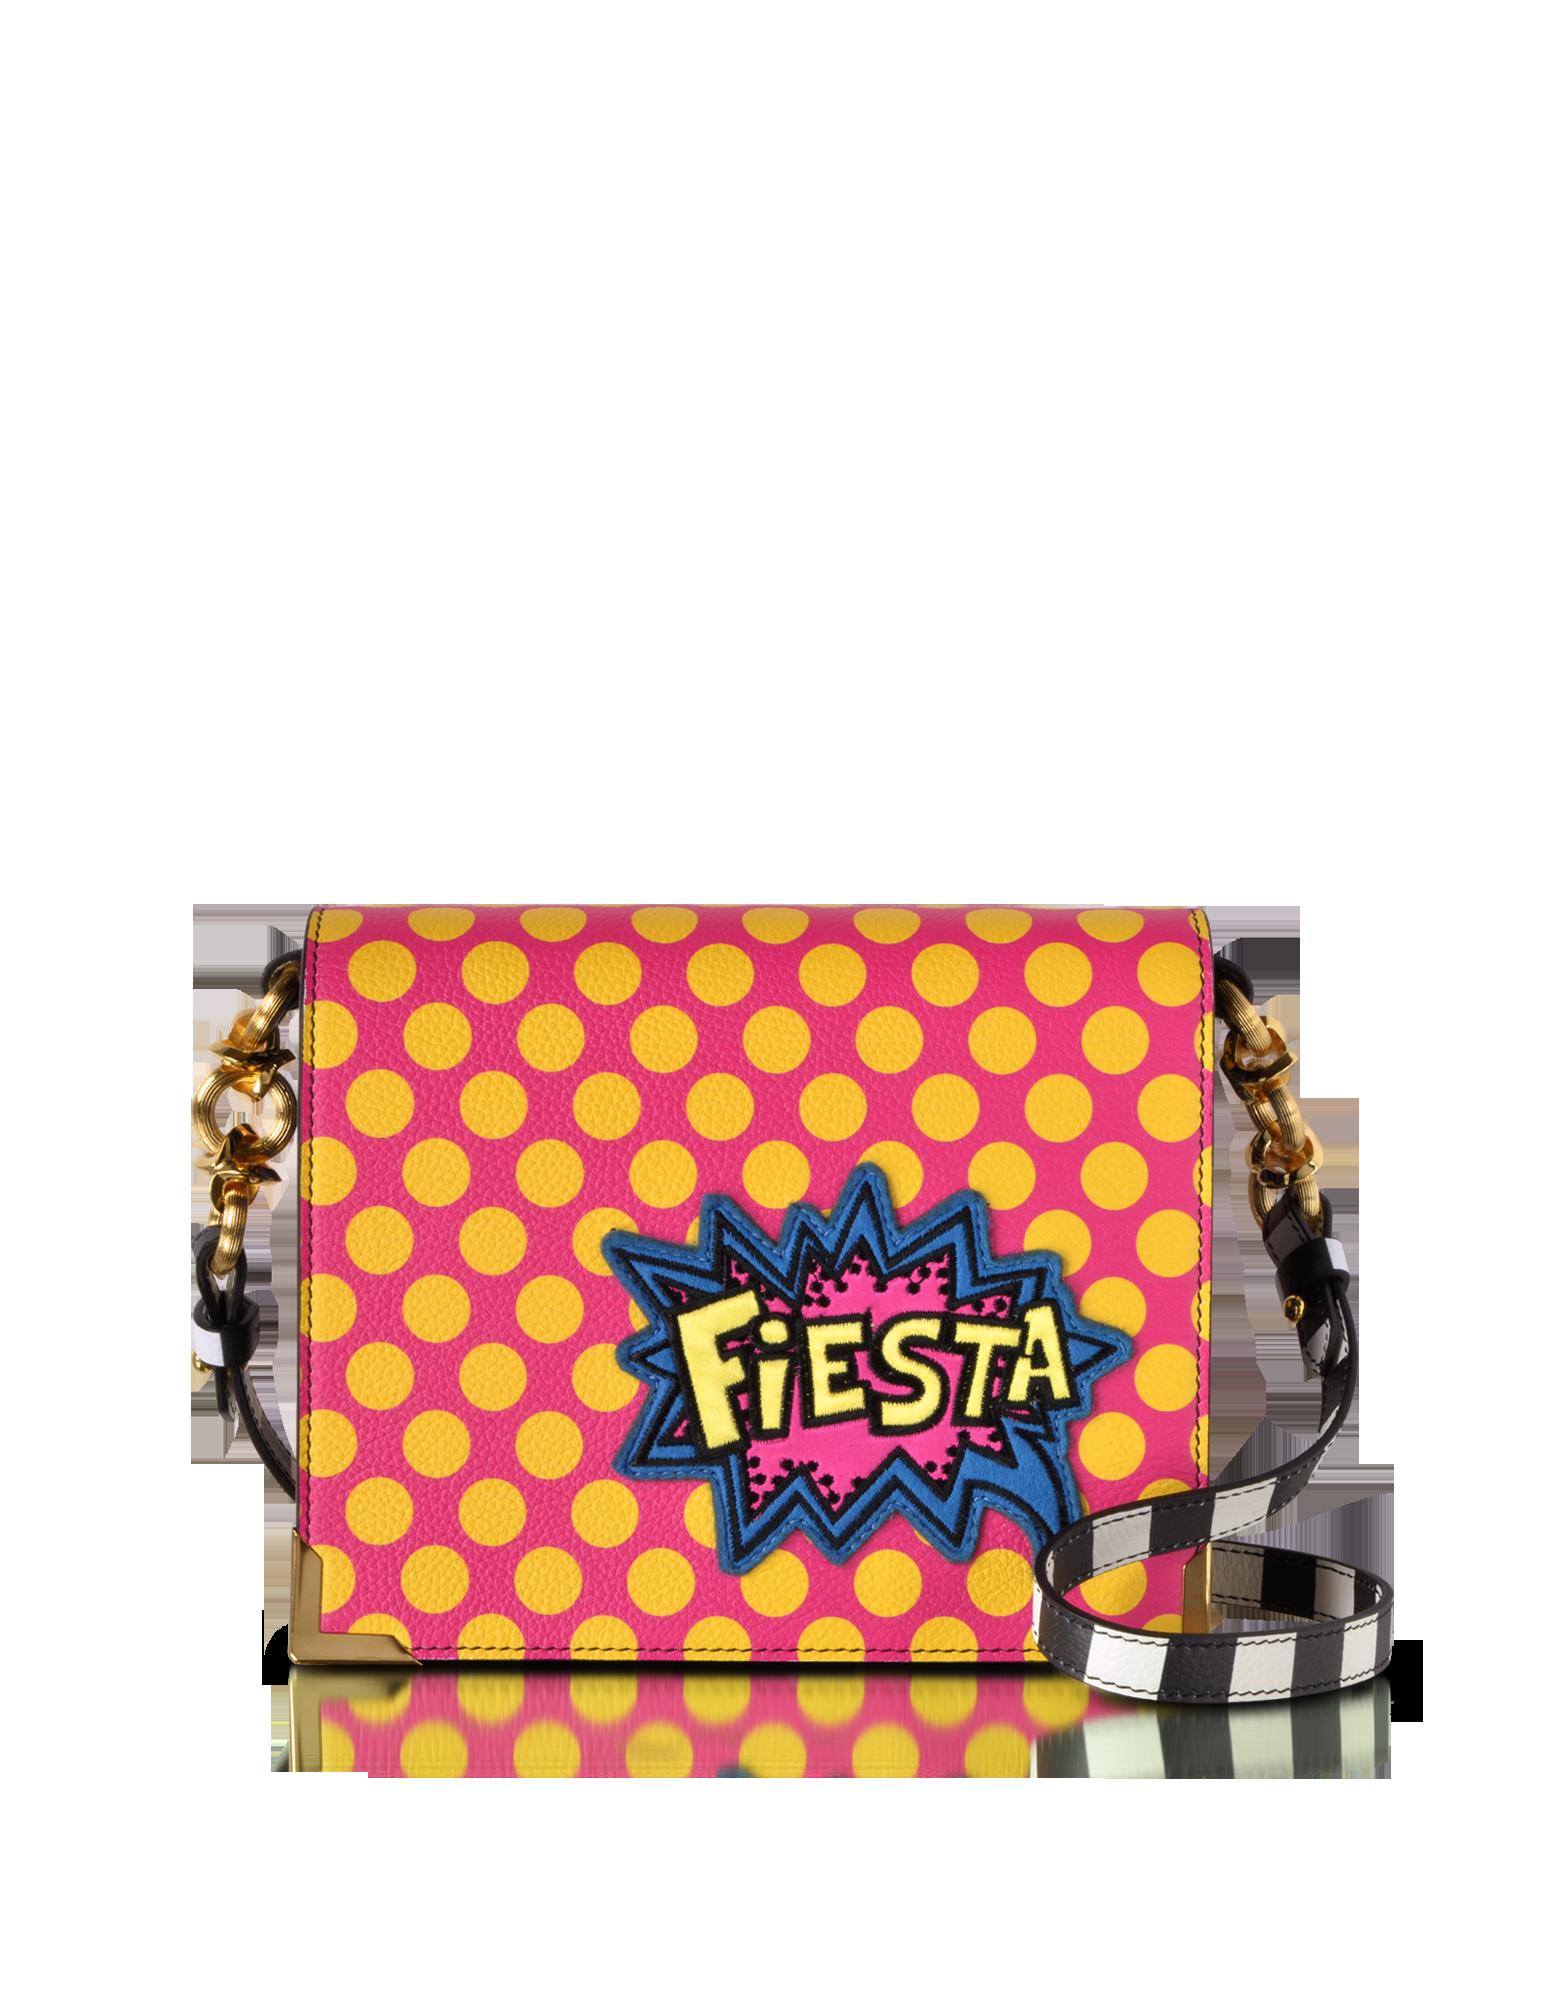 Image of Hera Pop Fiesta Leather Shoulder Bag